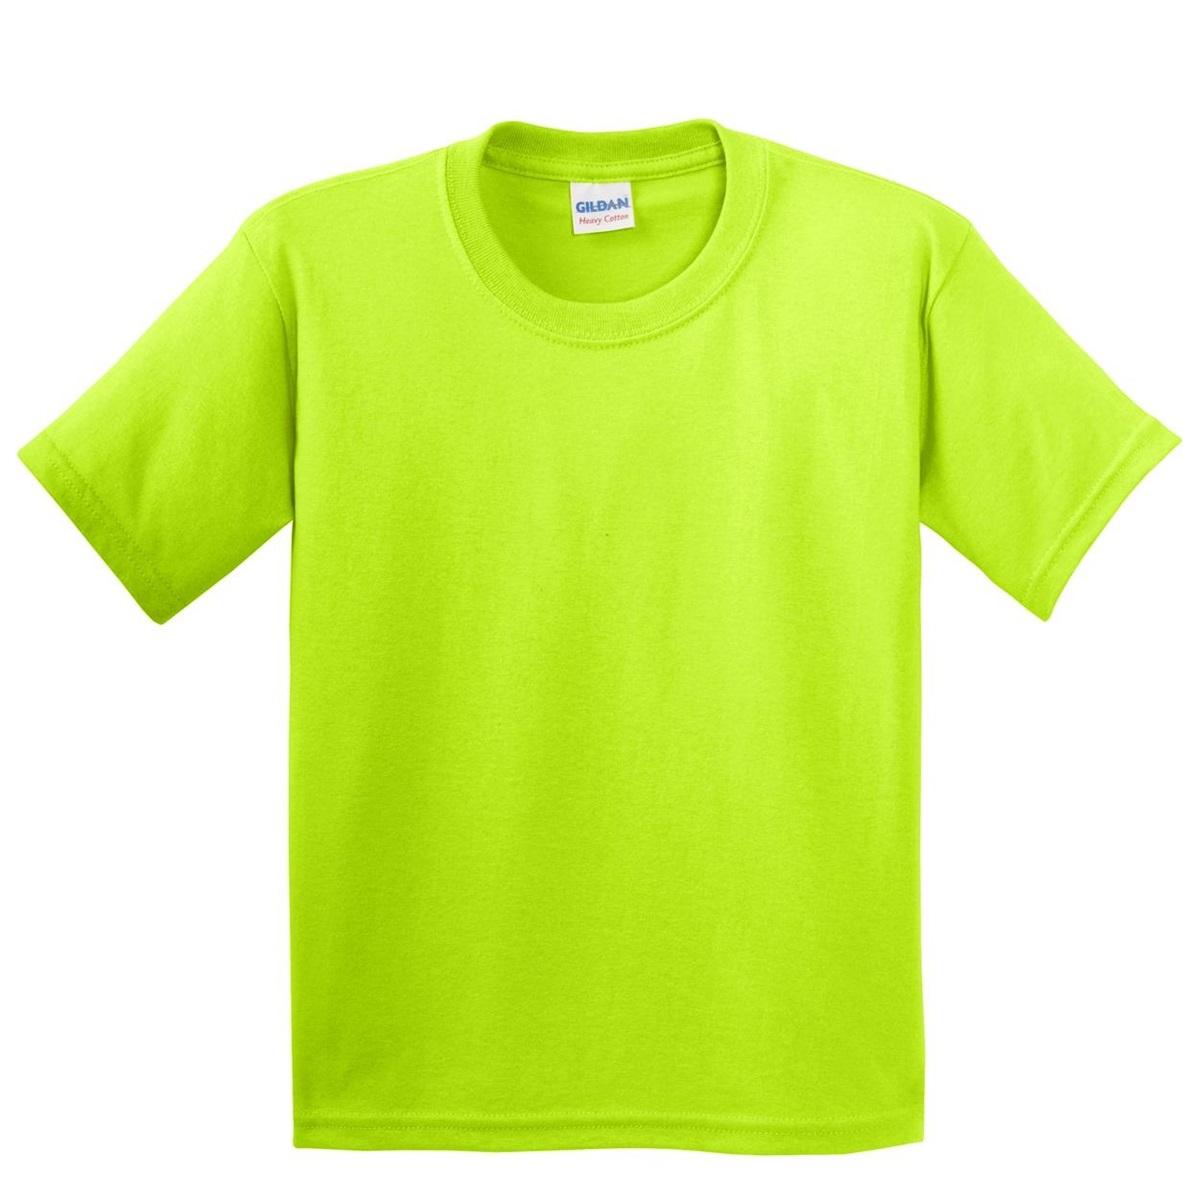 Gildan 5000b Youth Heavy Cotton T Shirt Safety Green